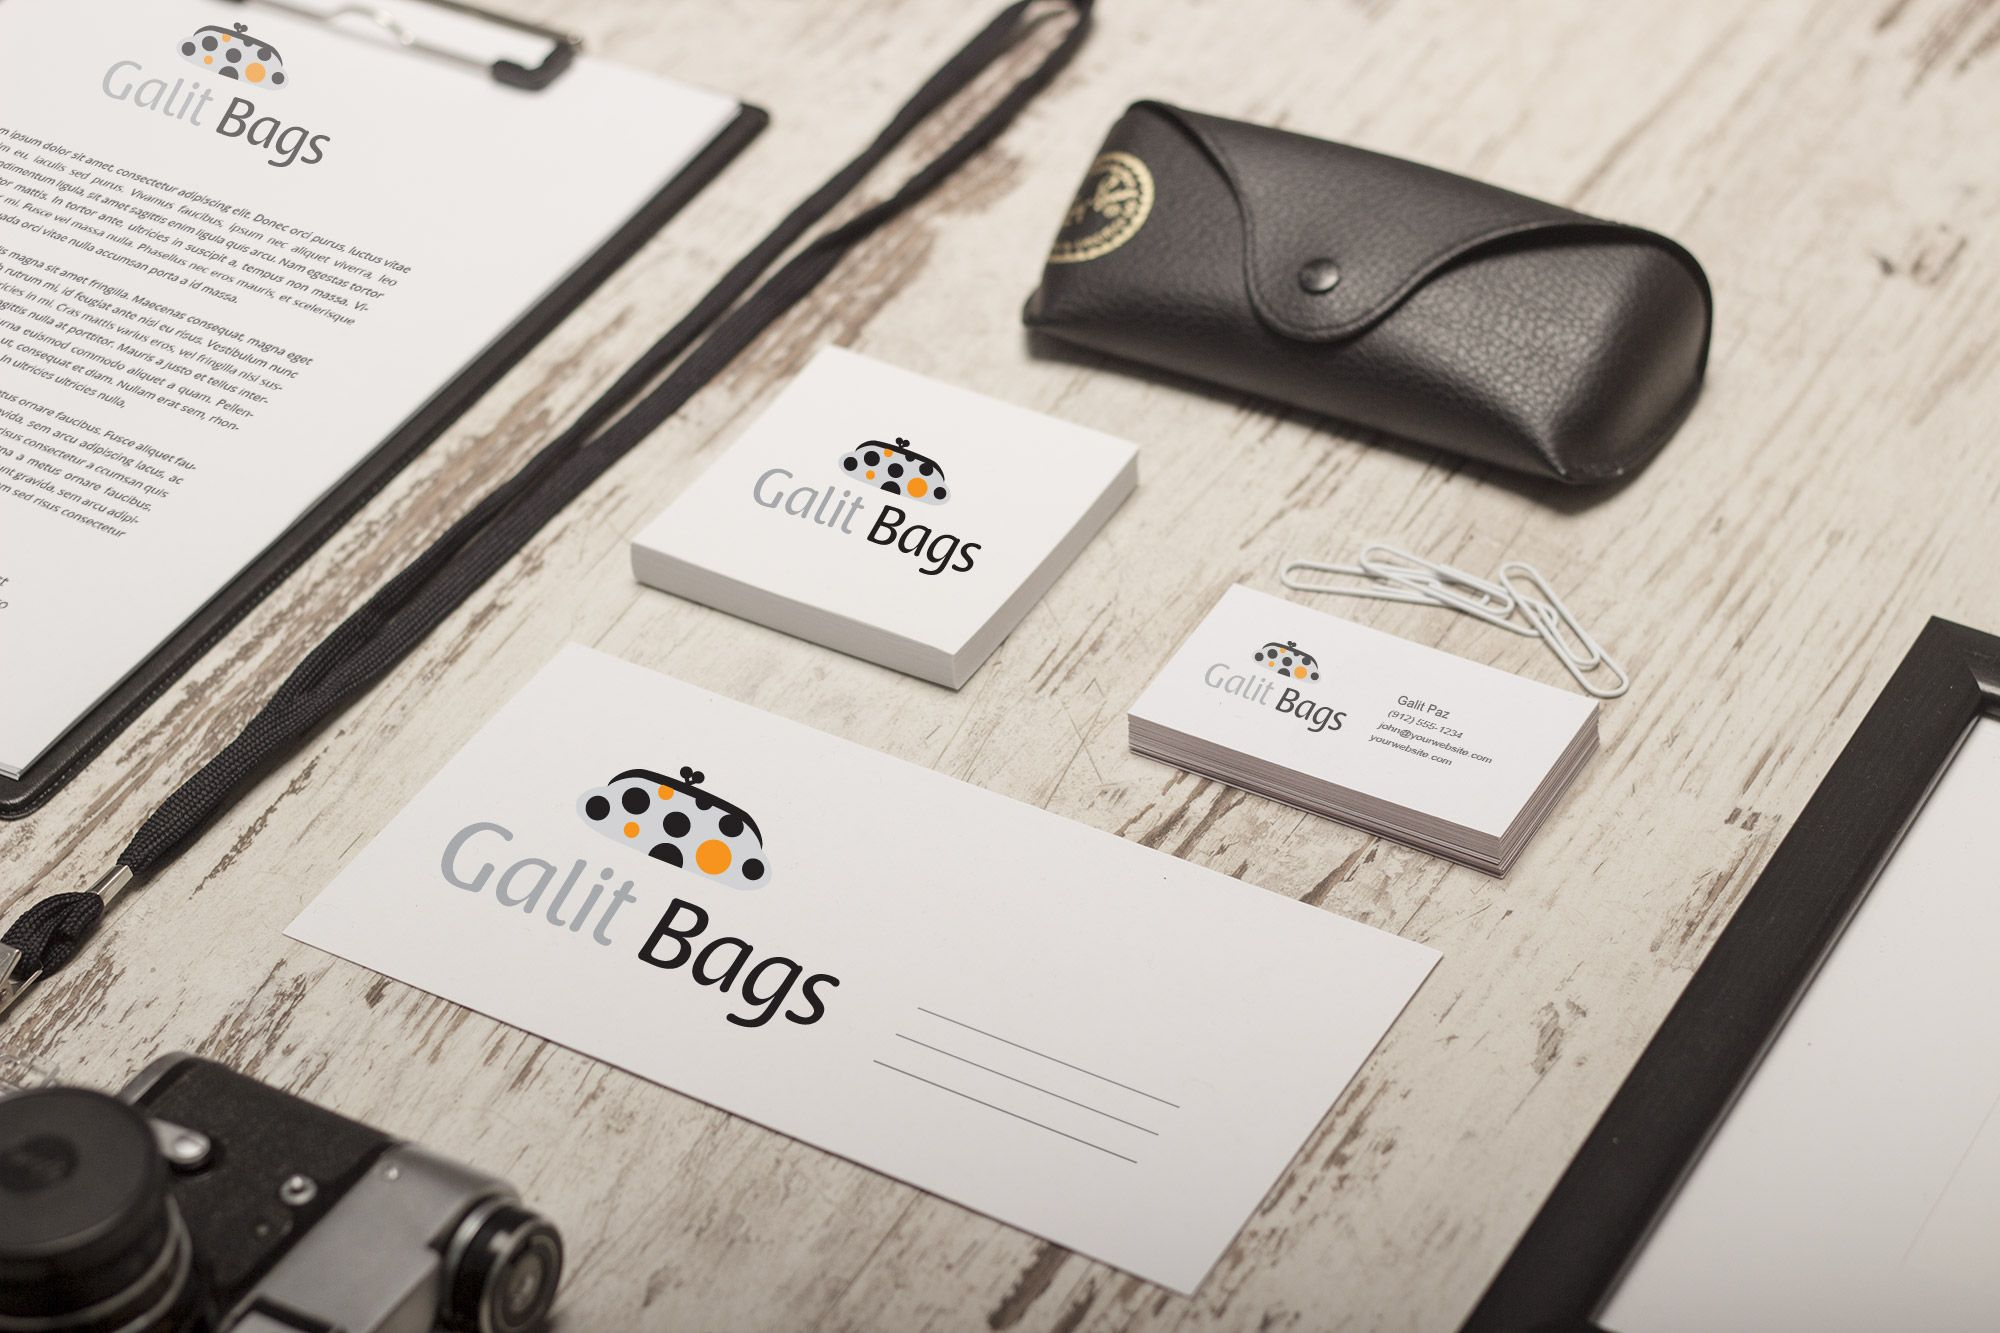 Galit Bags - Branding http://www.yaelsegall.com/